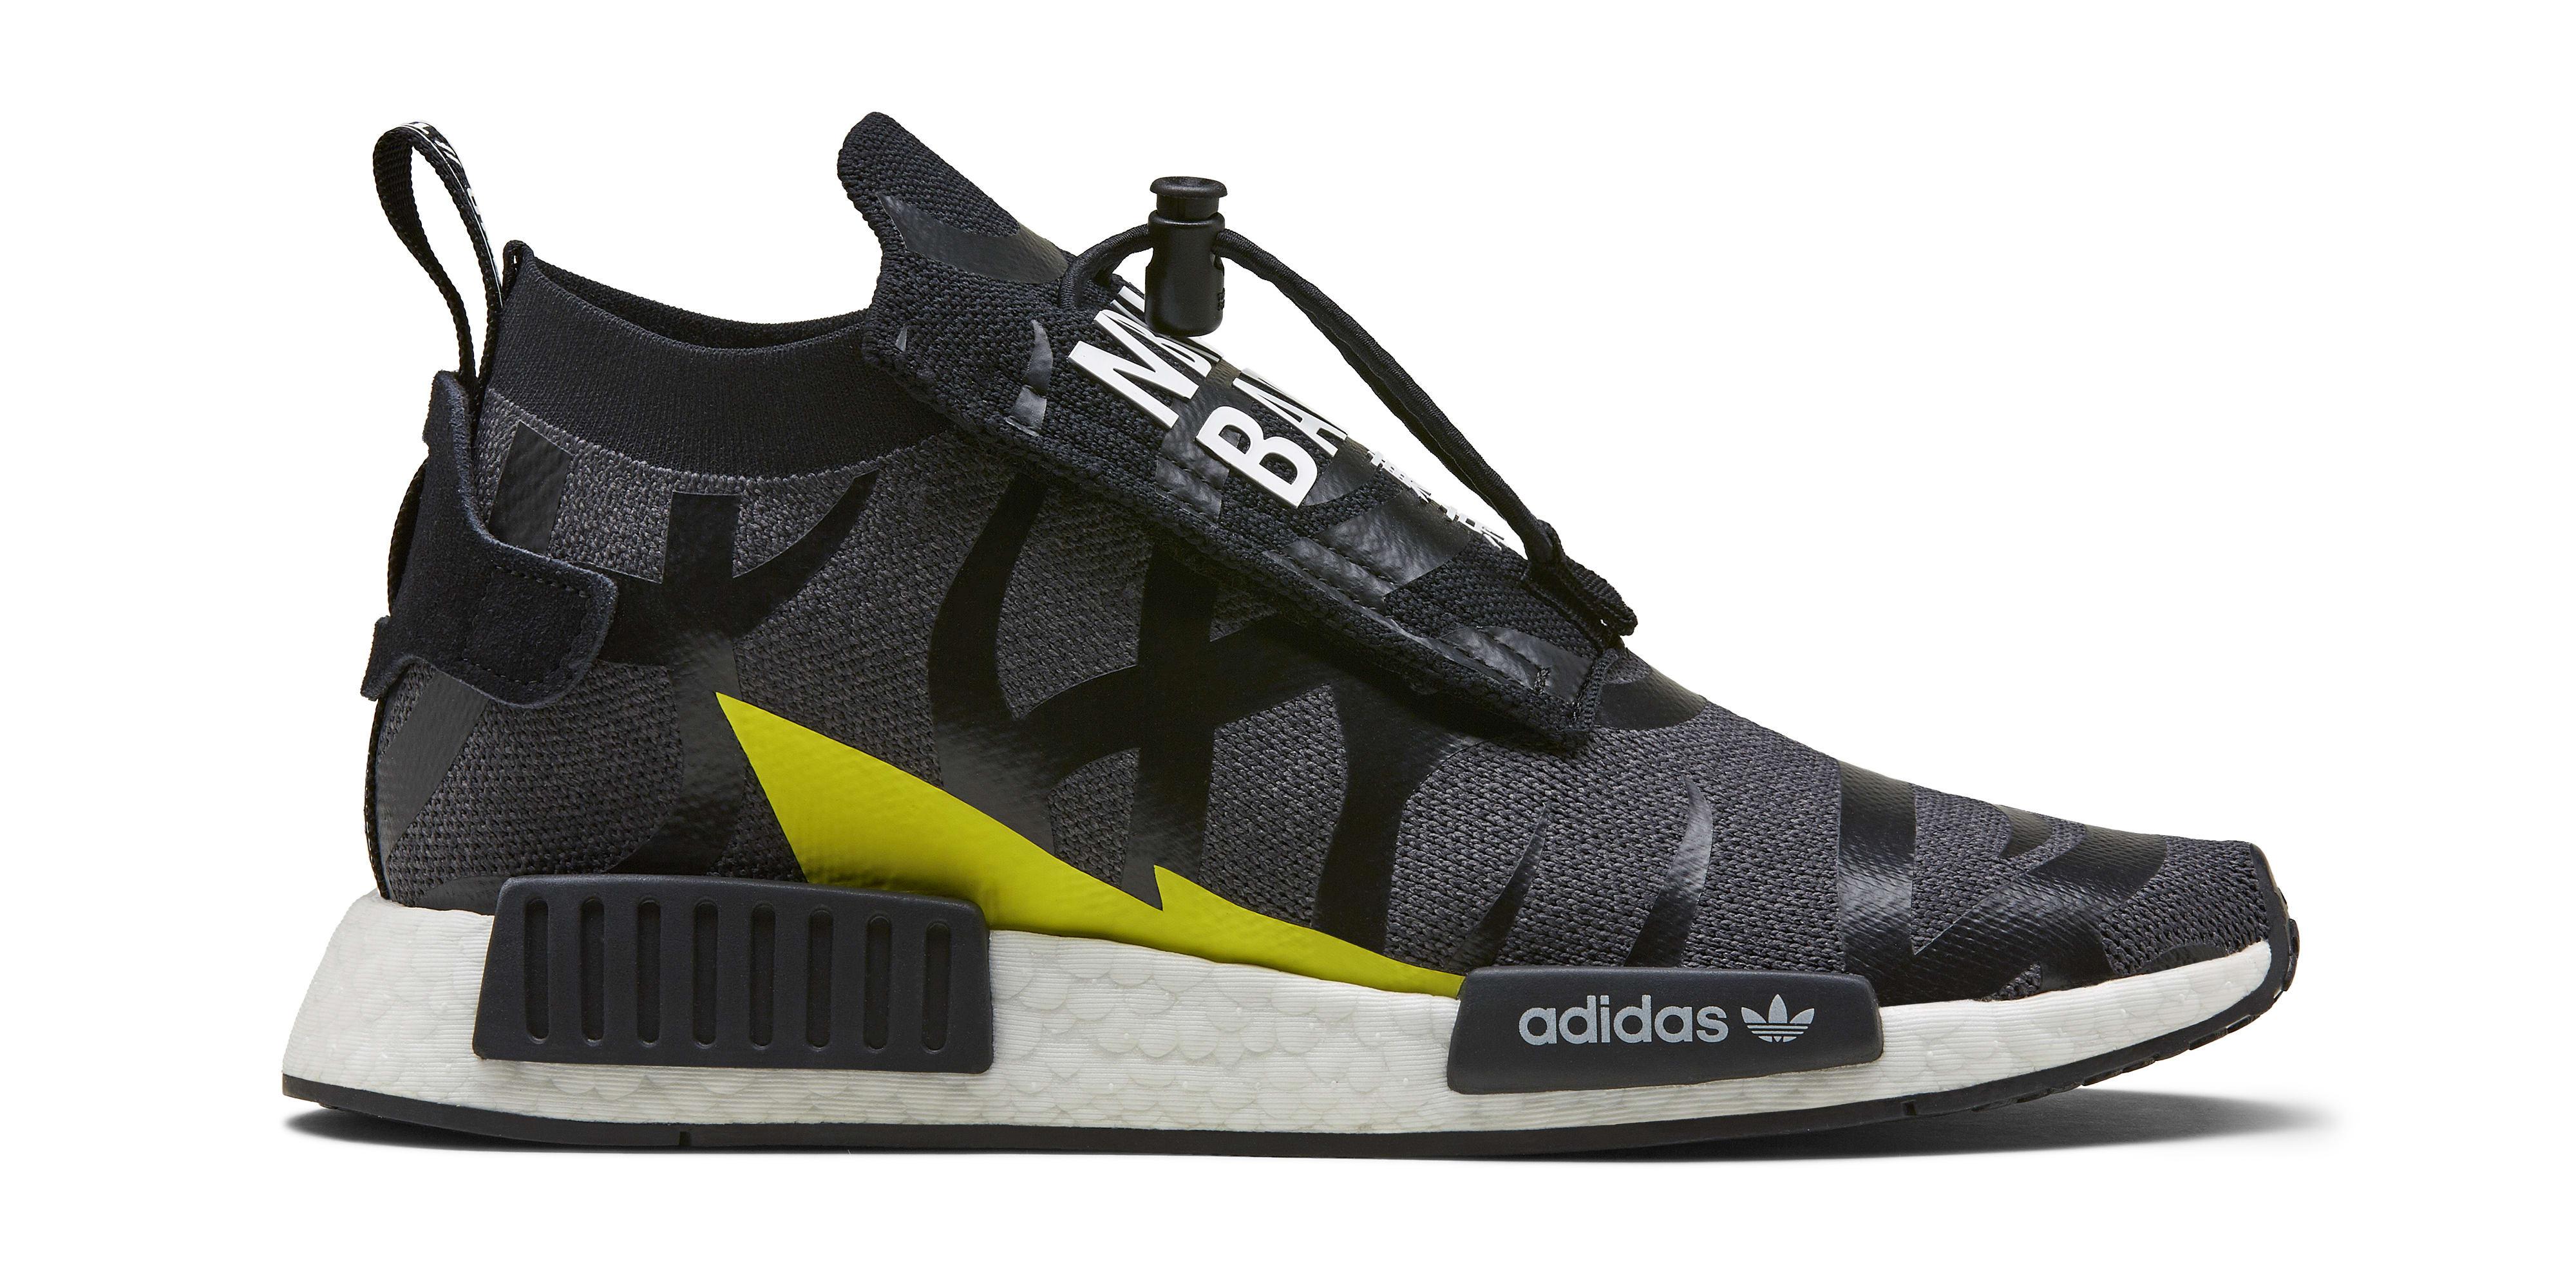 Bape x Neighborhood x Adidas NMD STLT EE9702 (Lateral)